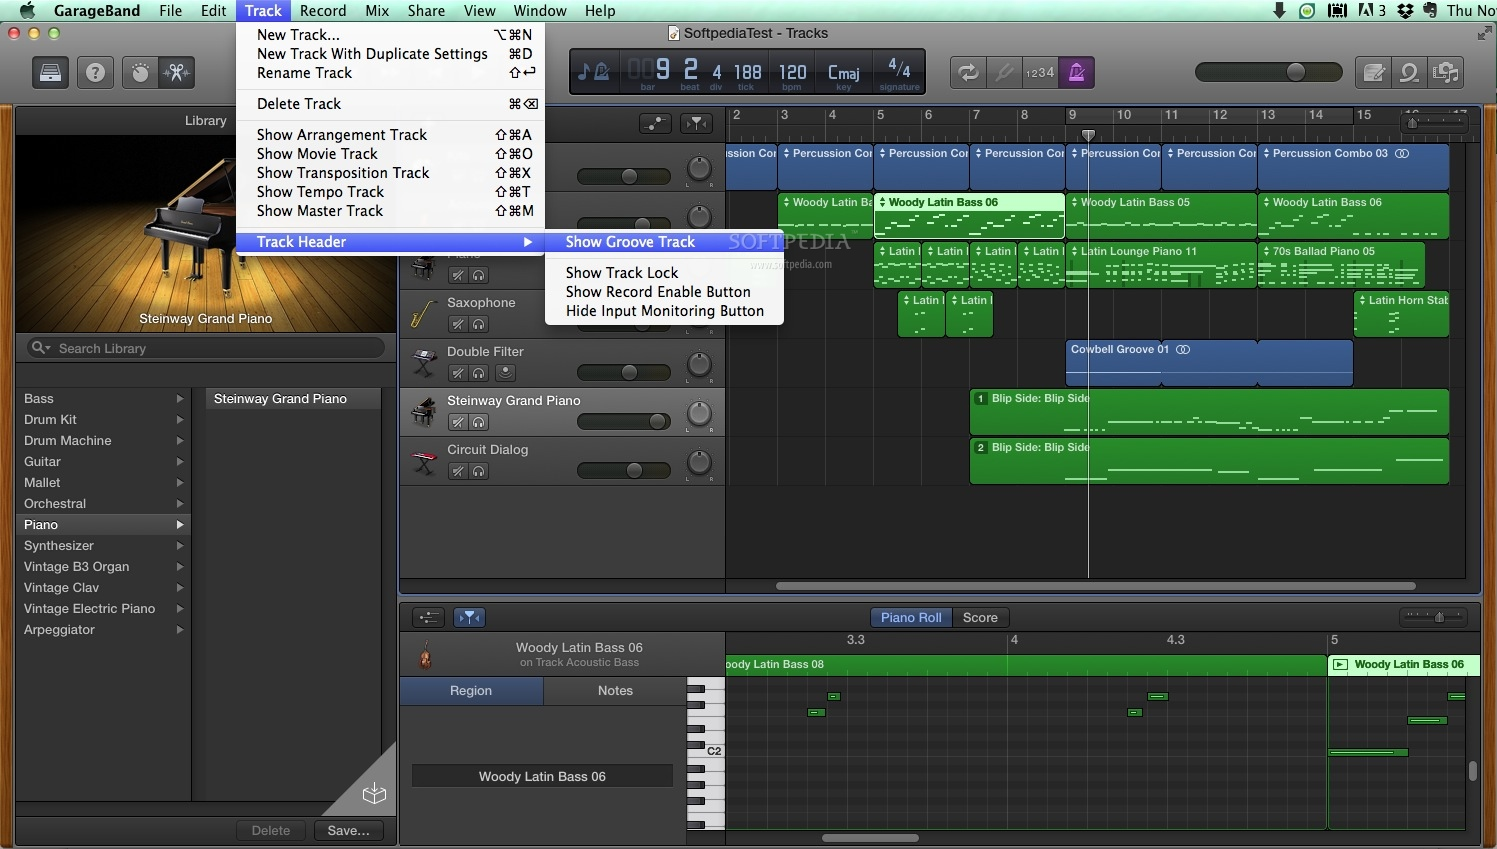 Download apple garageband mac 10. 3. 2.